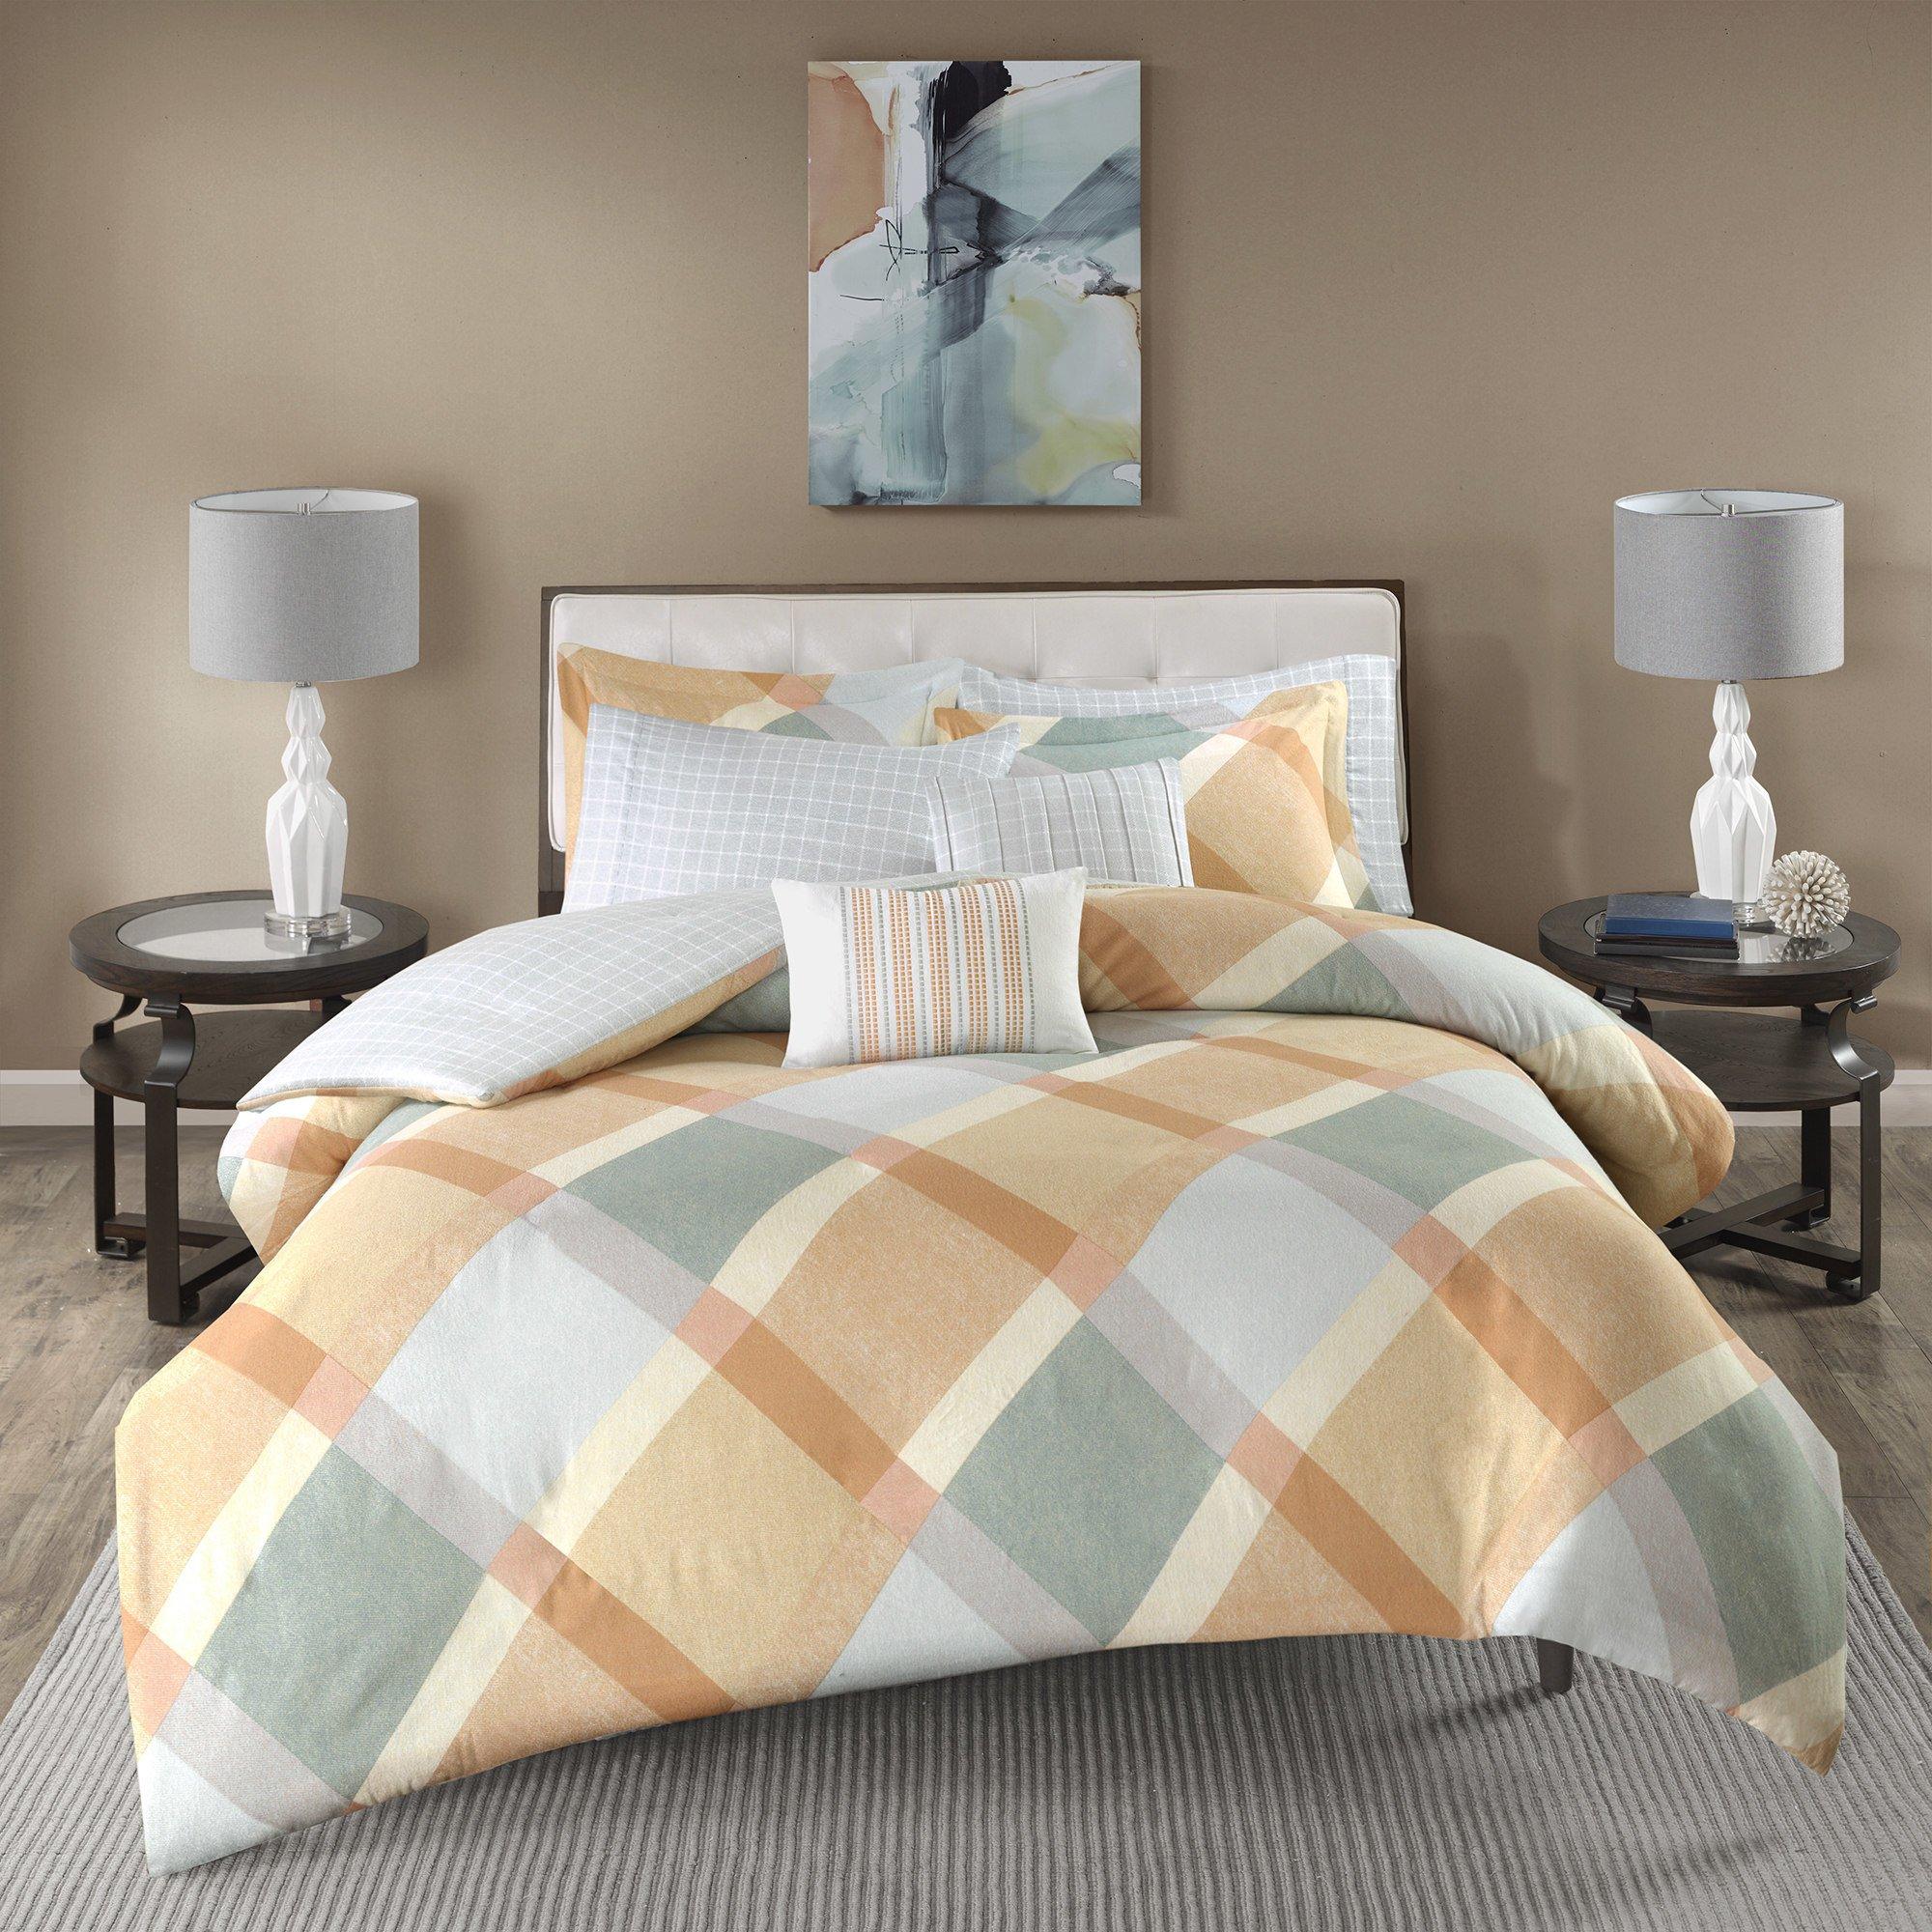 7 Piece Coral Orange Grey Off White Checkered Diamond Plaid Themed Flannel Duvet Cover Full Queen Set, Beautiful Geometric Checker Bedding, Chic Reverse Windowpane Theme Pattern, Cotton